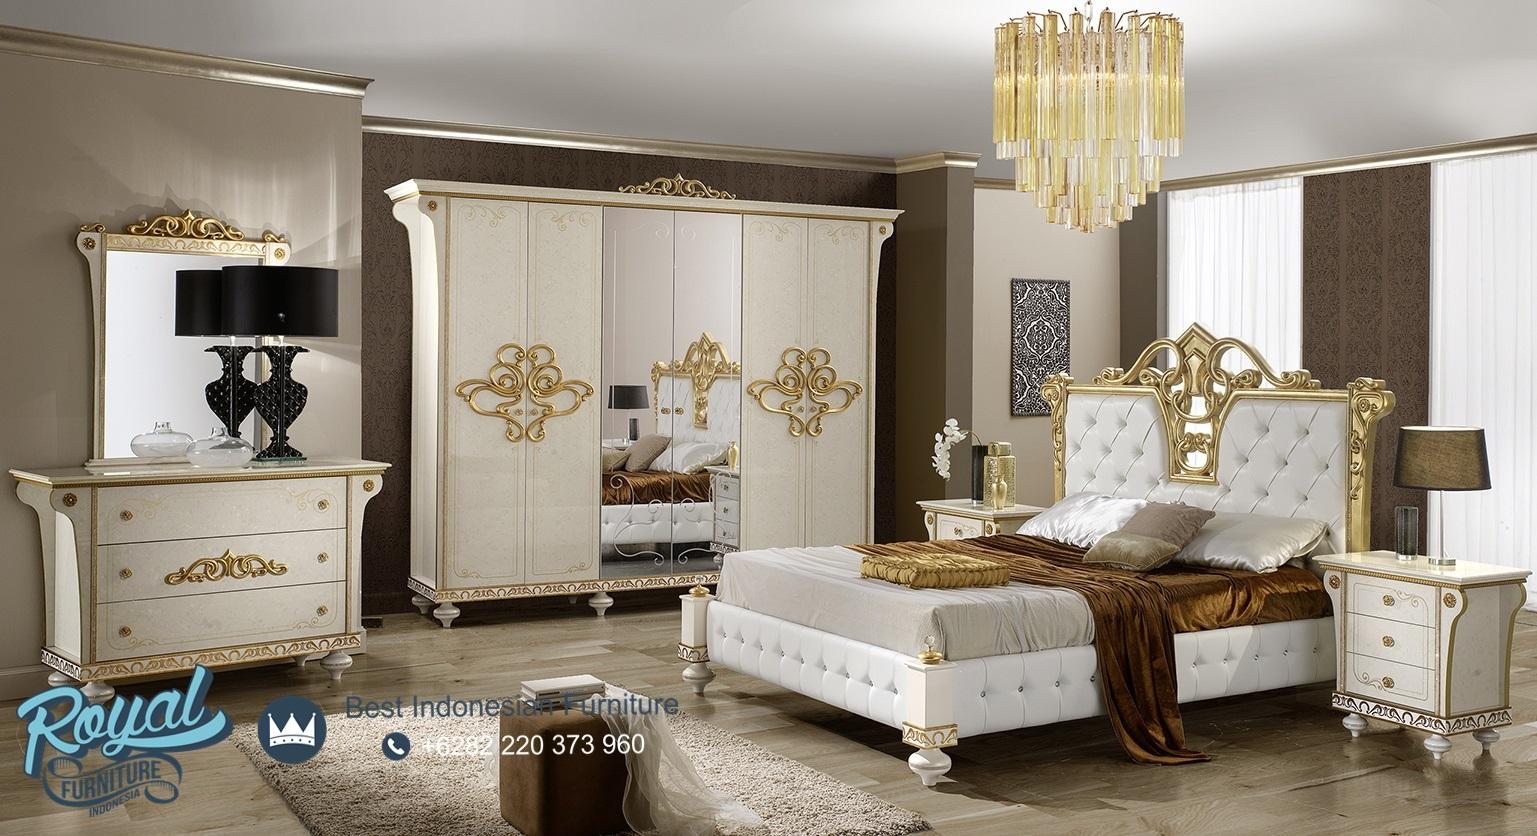 Kamar Tidur Putih Duco Mewah Modern Ukir Jepara Desiree, set kamar tidur putih duco, tempat tidur mewah, kamar set minimalis mewah, set kamar tidur mewah modern, harga tempat tidur mewah, tempat tidur jepara terbaru, kamar set mewah terbaru, model kamar set pengantin terbaru, harga tempat tidur jati satu set, satu set kamar tidur klasik, set kamar tidur mewah terbaru, set kamar tidur elegan, set kamar tidur jati jepara, desain kamar tidur mewah jepara, tempat tidur utama, kamar tidur kayu jepara, mebel jepara, furniture kamar tidur jati jepara,tempat tidur ukiran jepara, royal furniture